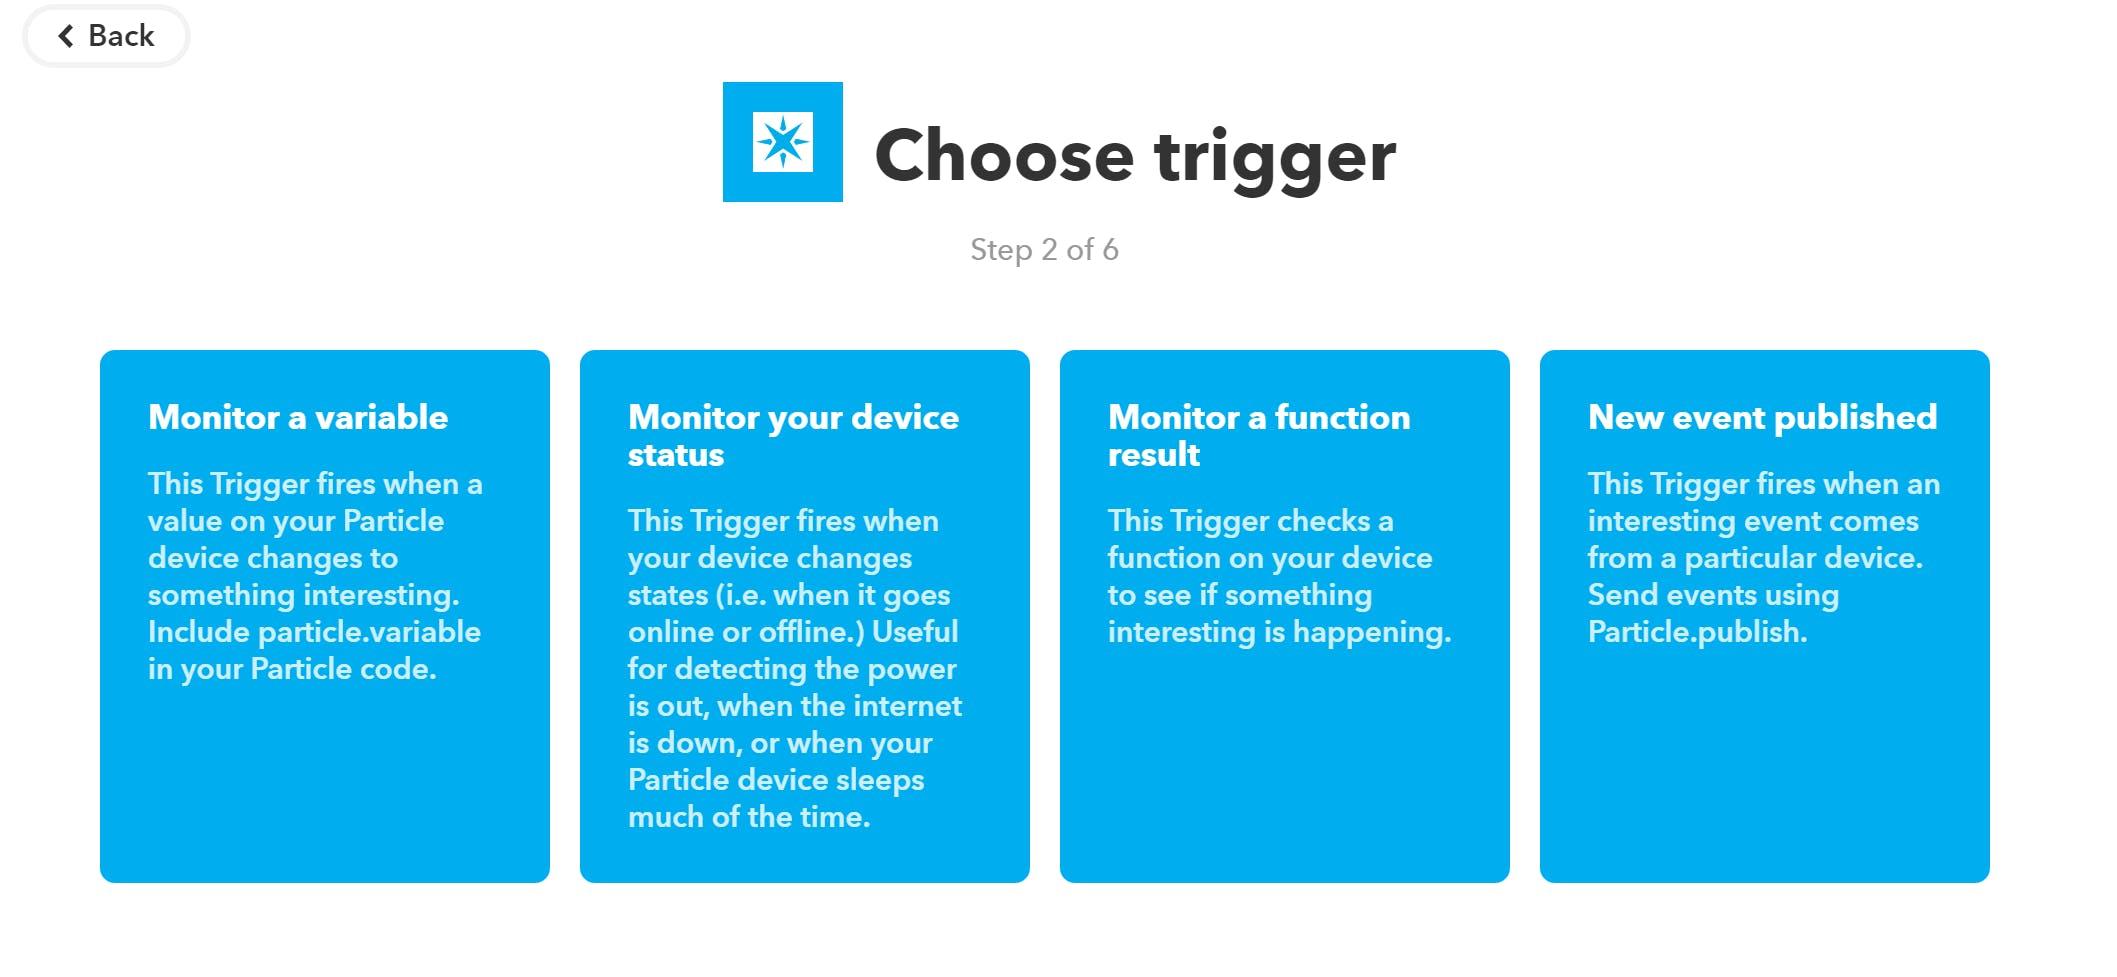 Choose the event published trigger